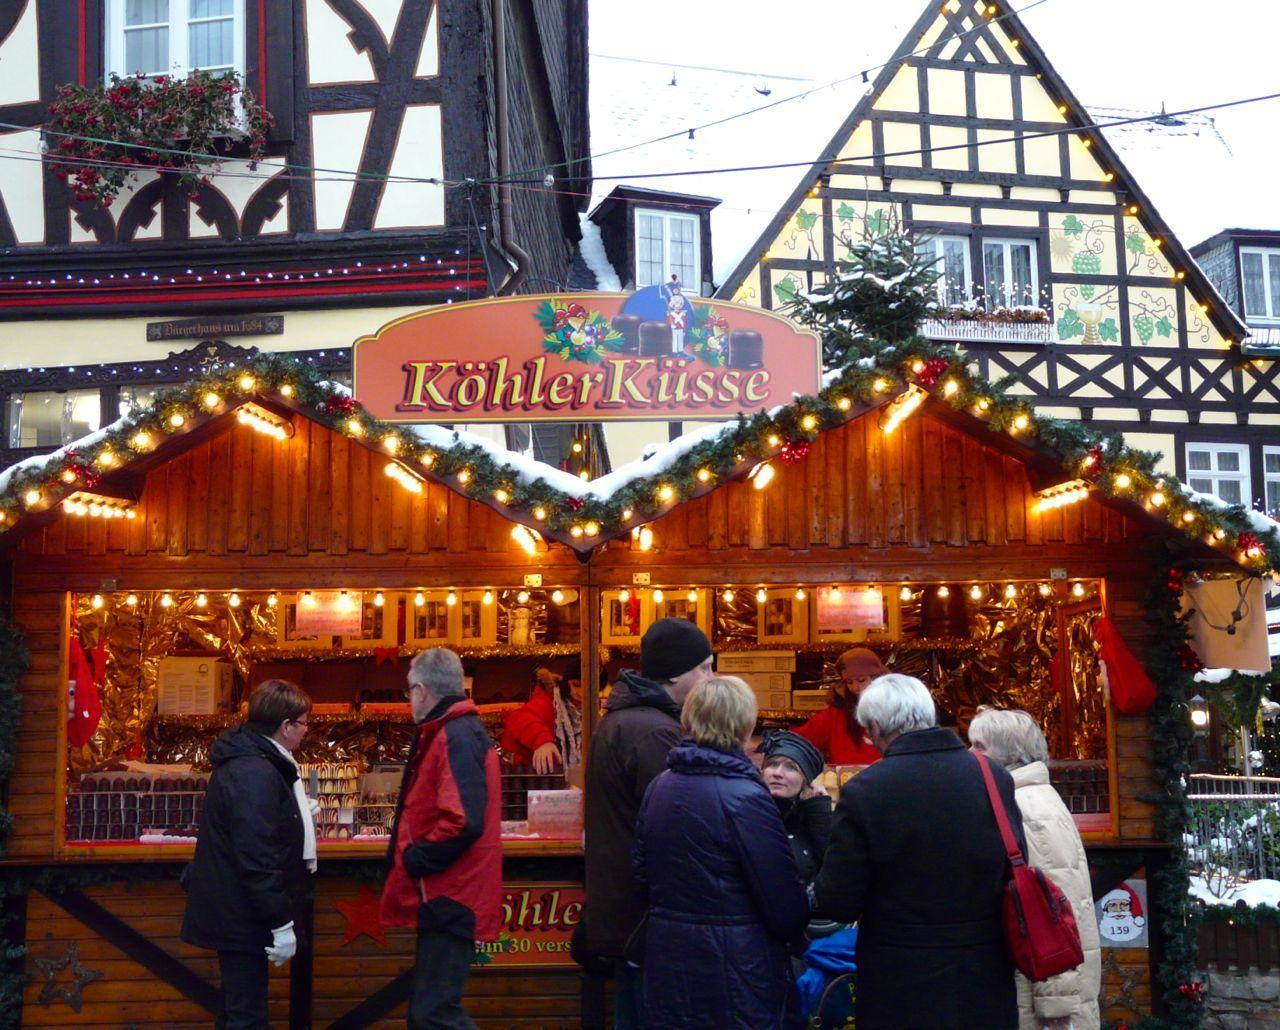 Christmas market in Rudesheim, Germany. Think food. Lots